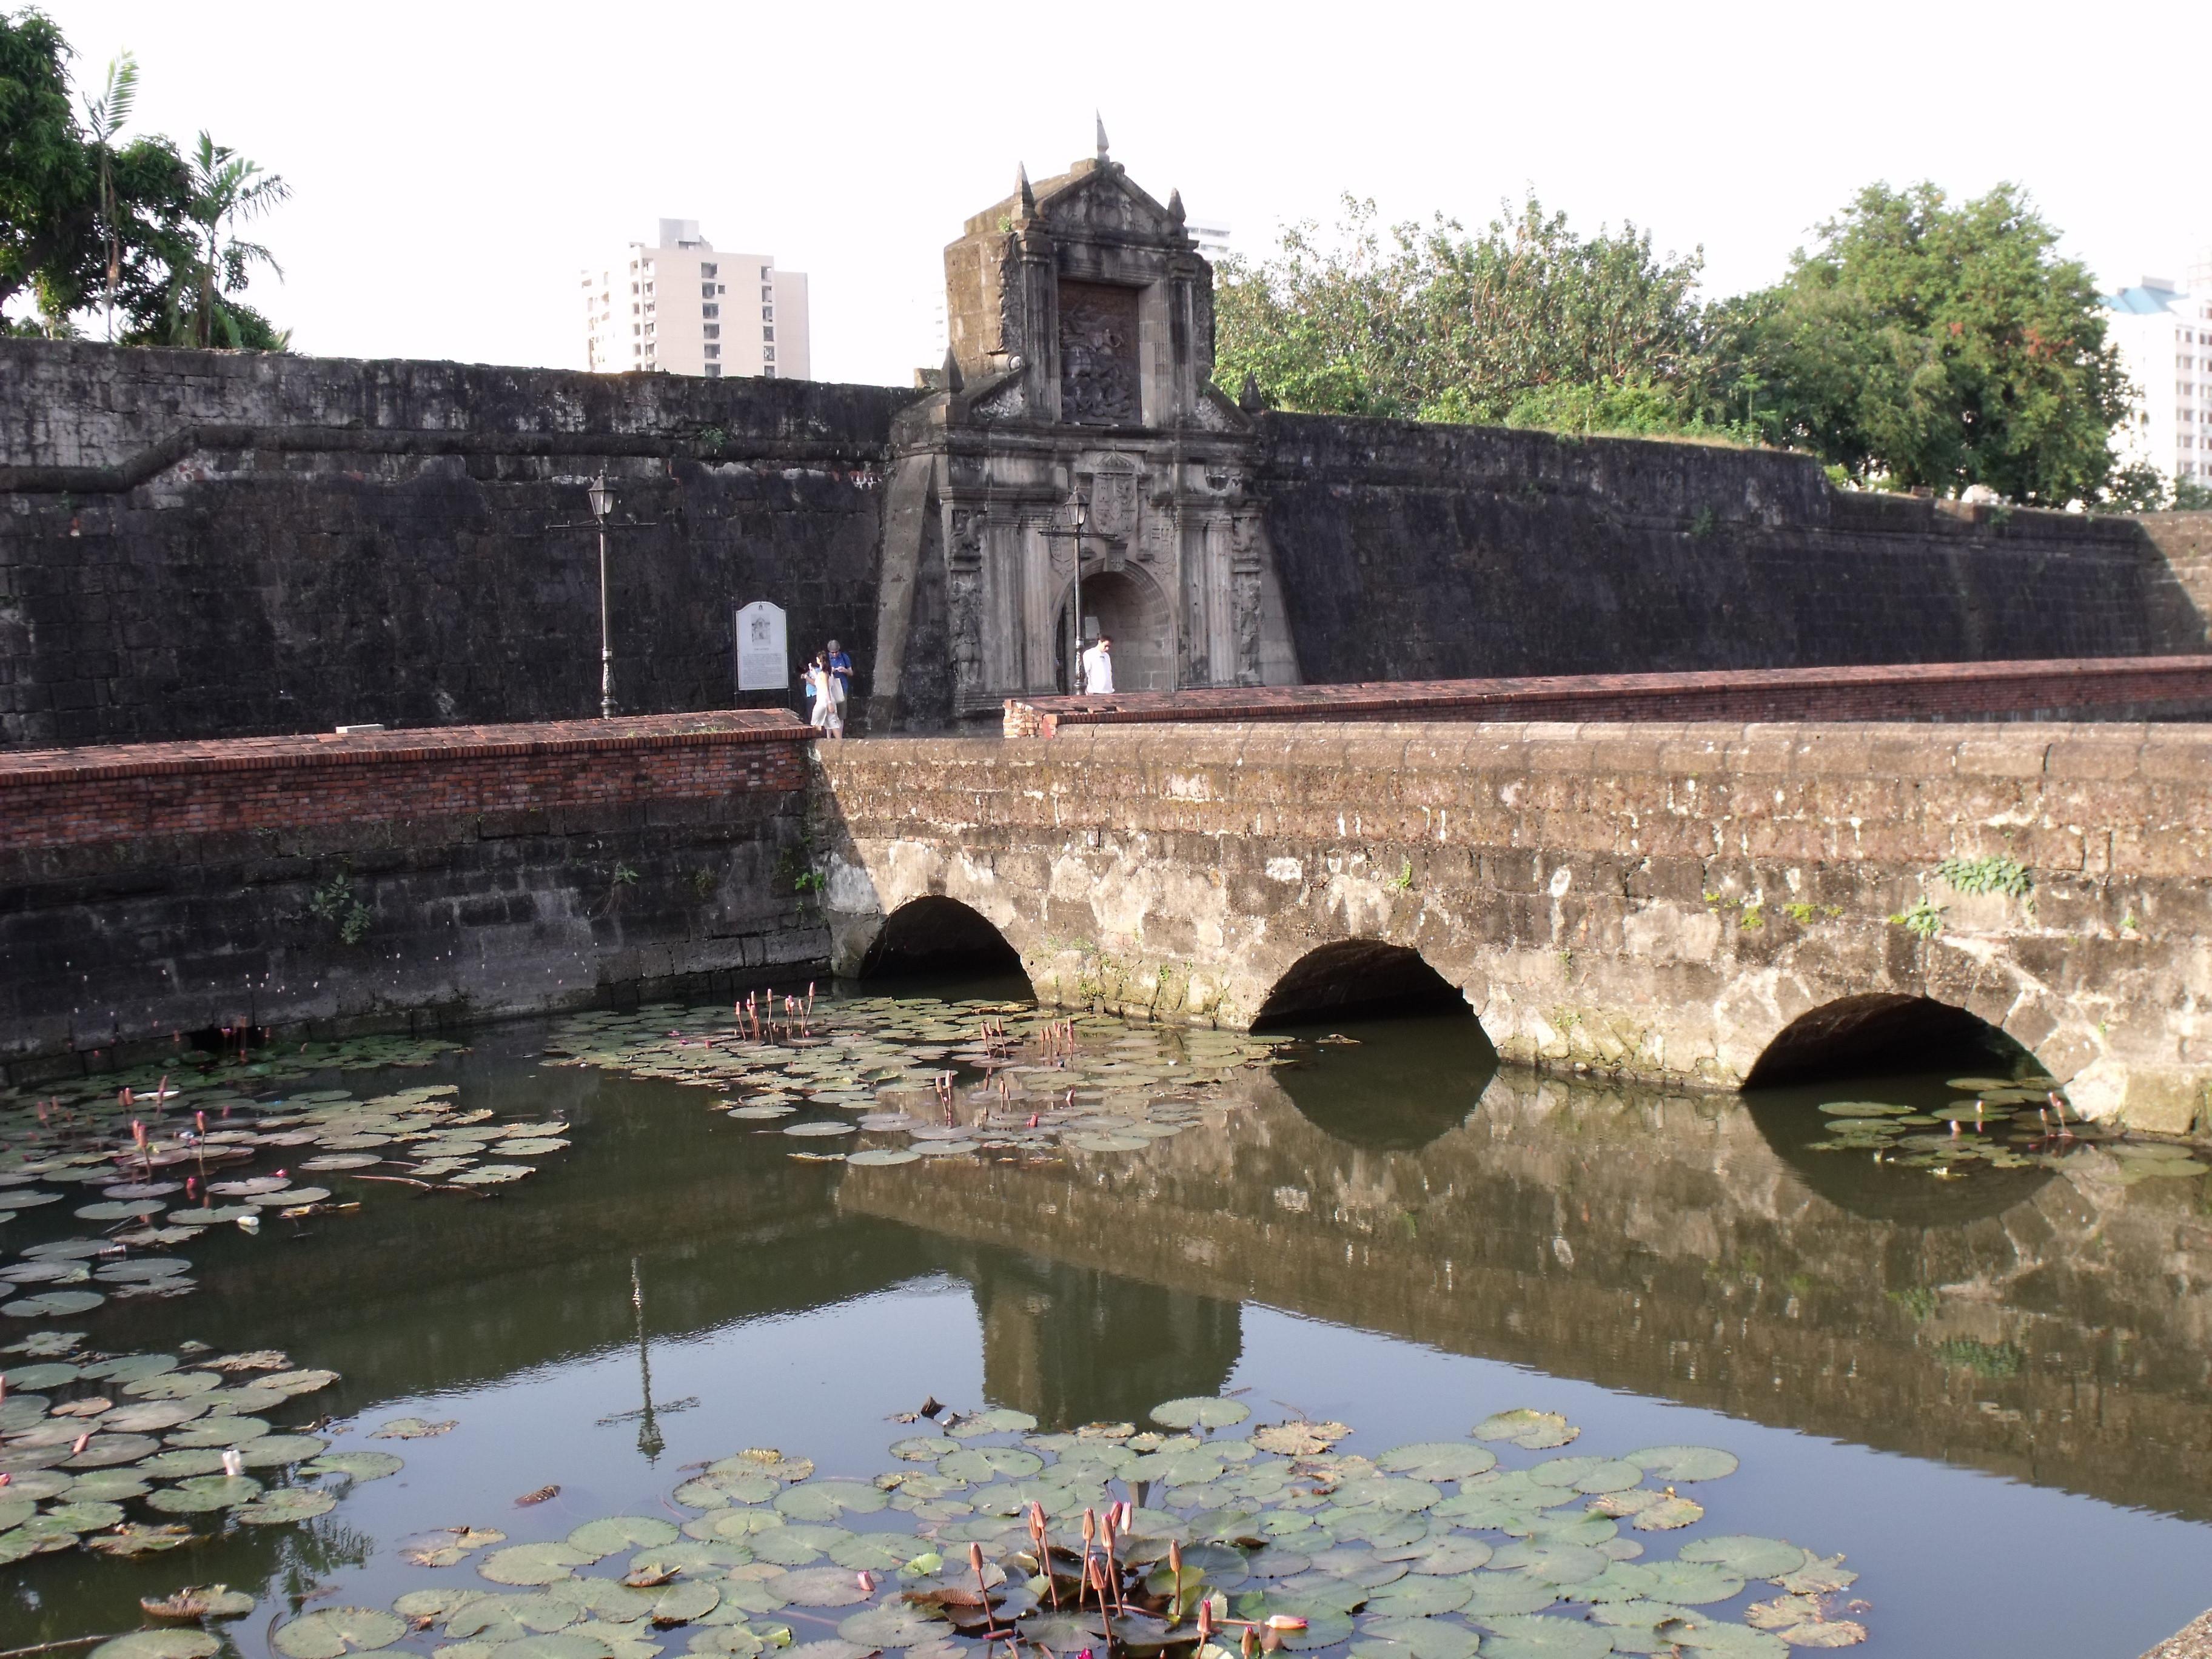 Entrance of Fort Santiago, Intramuros, Manila. Photo taken on December 25, 2009.